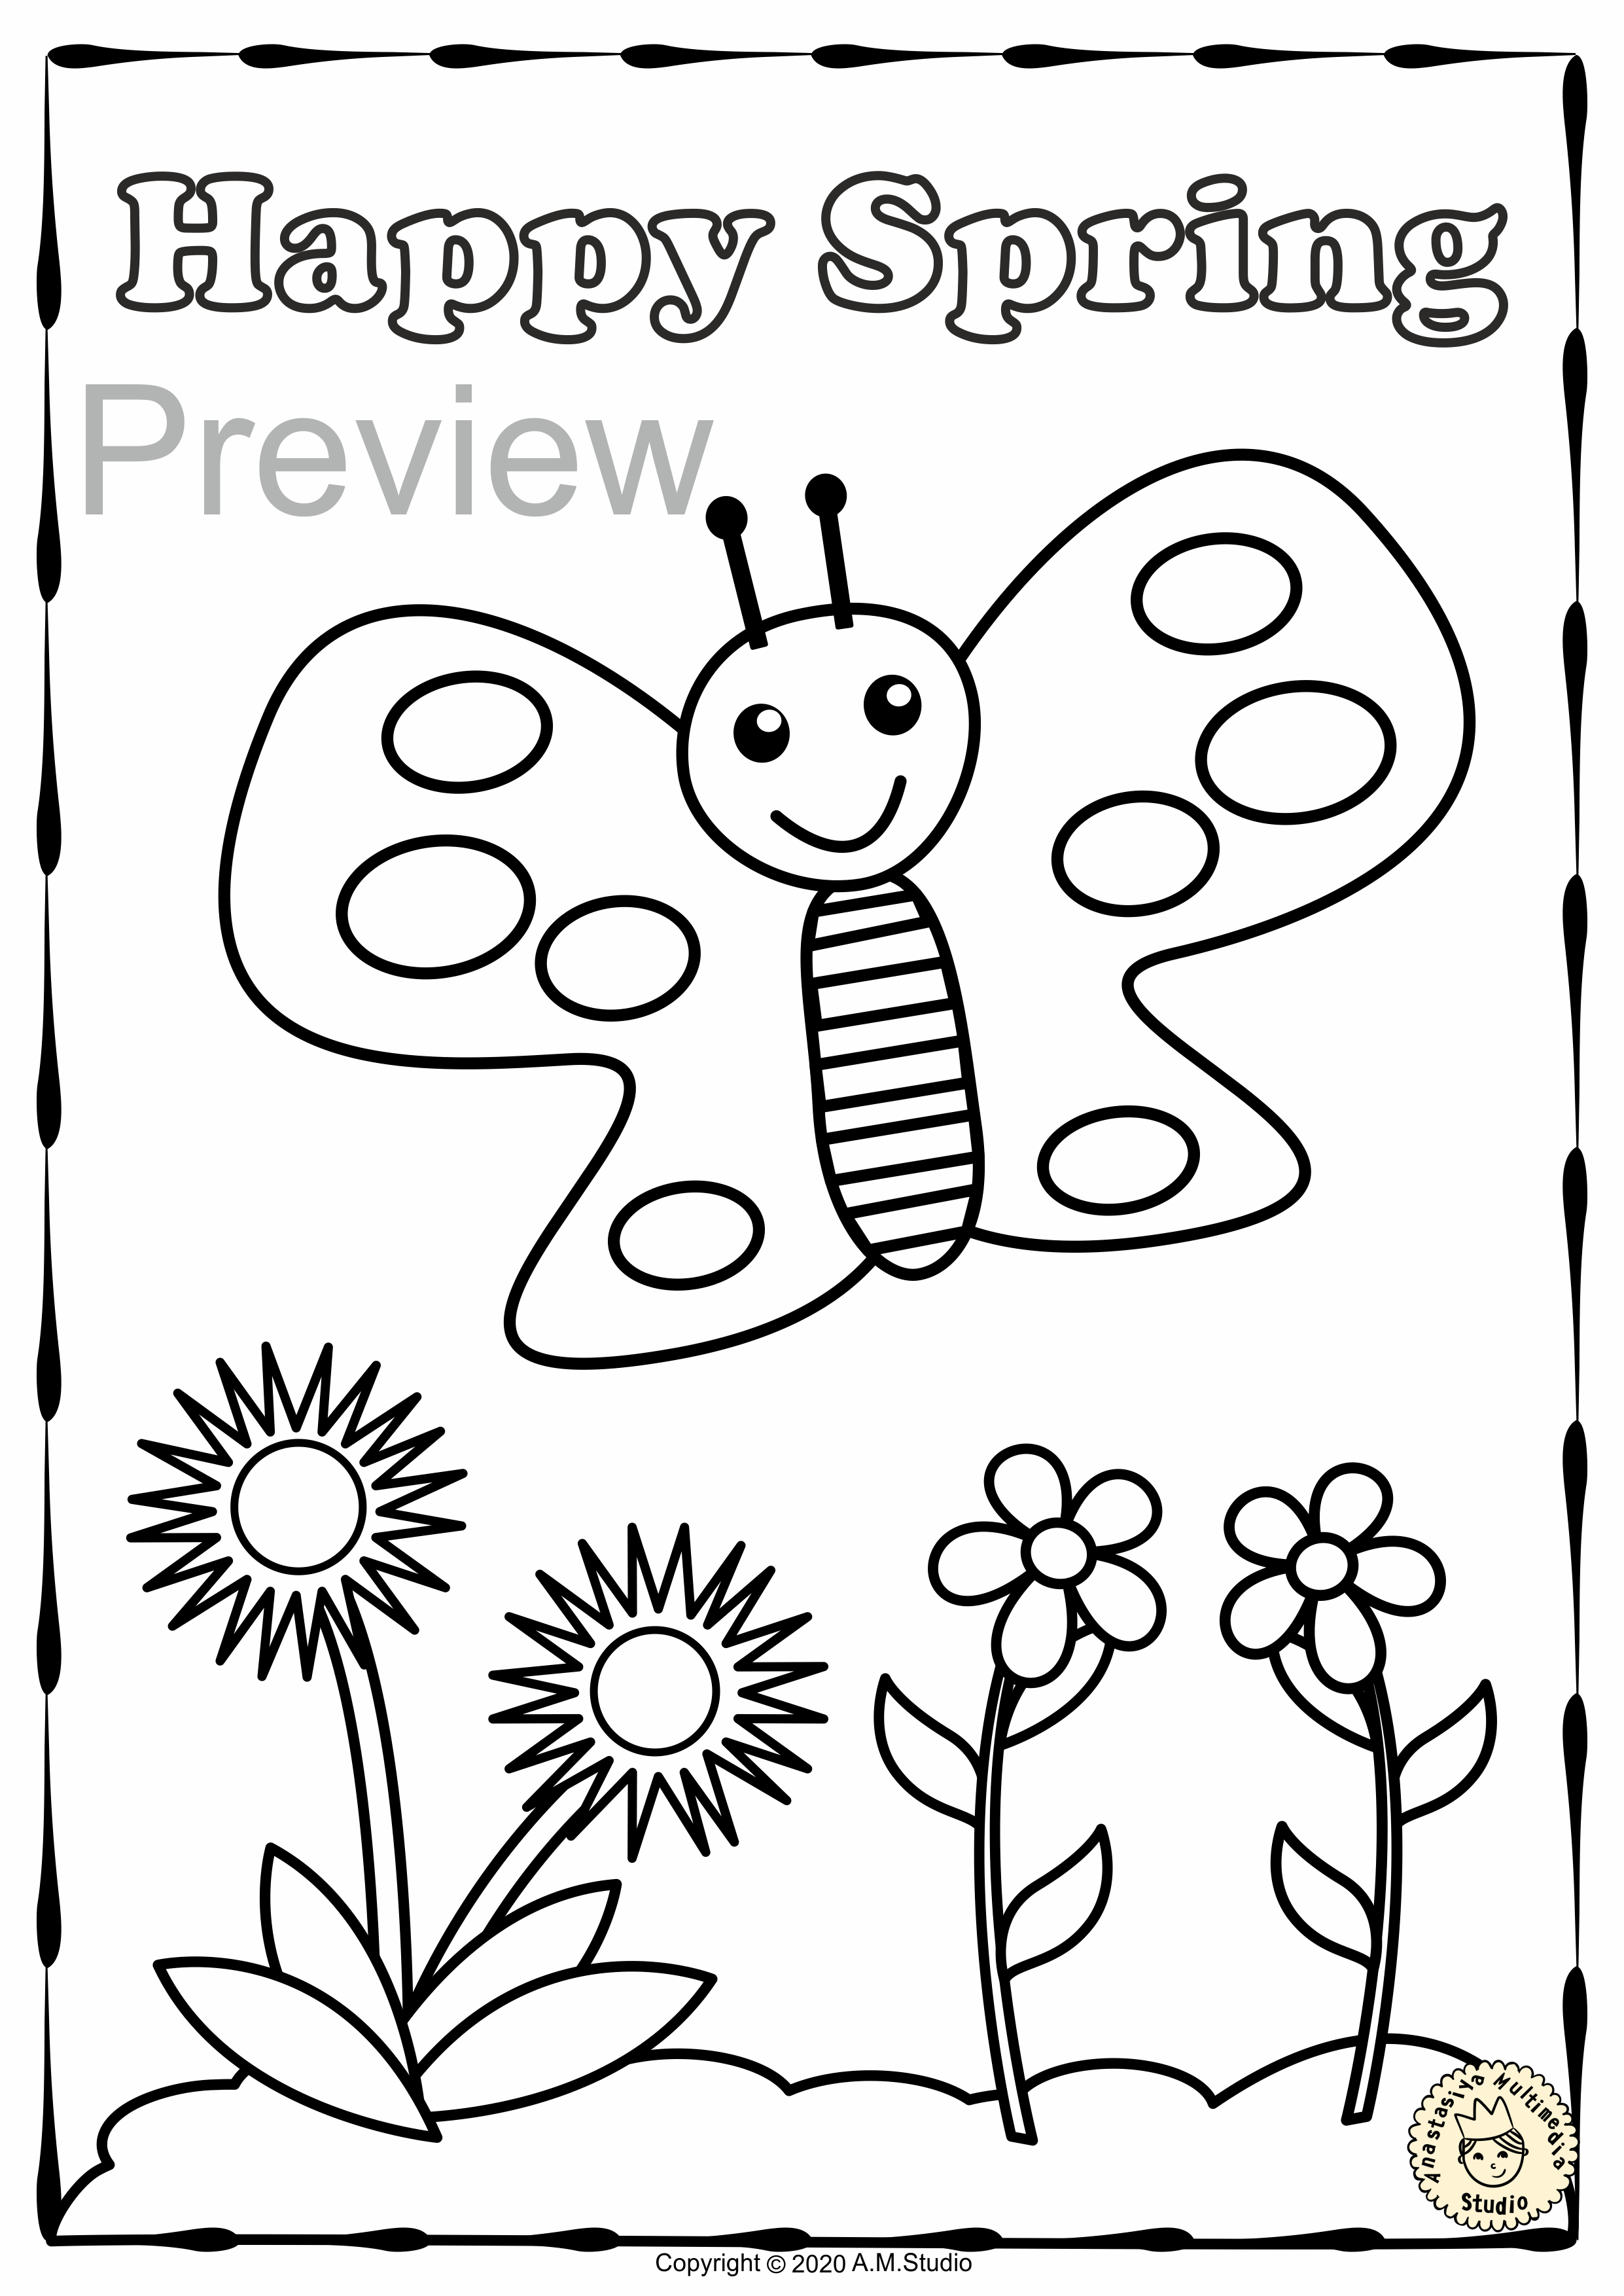 Spring Coloring Pages In 2020 Coloring Pages Spring Coloring Pages Spring Break Activity